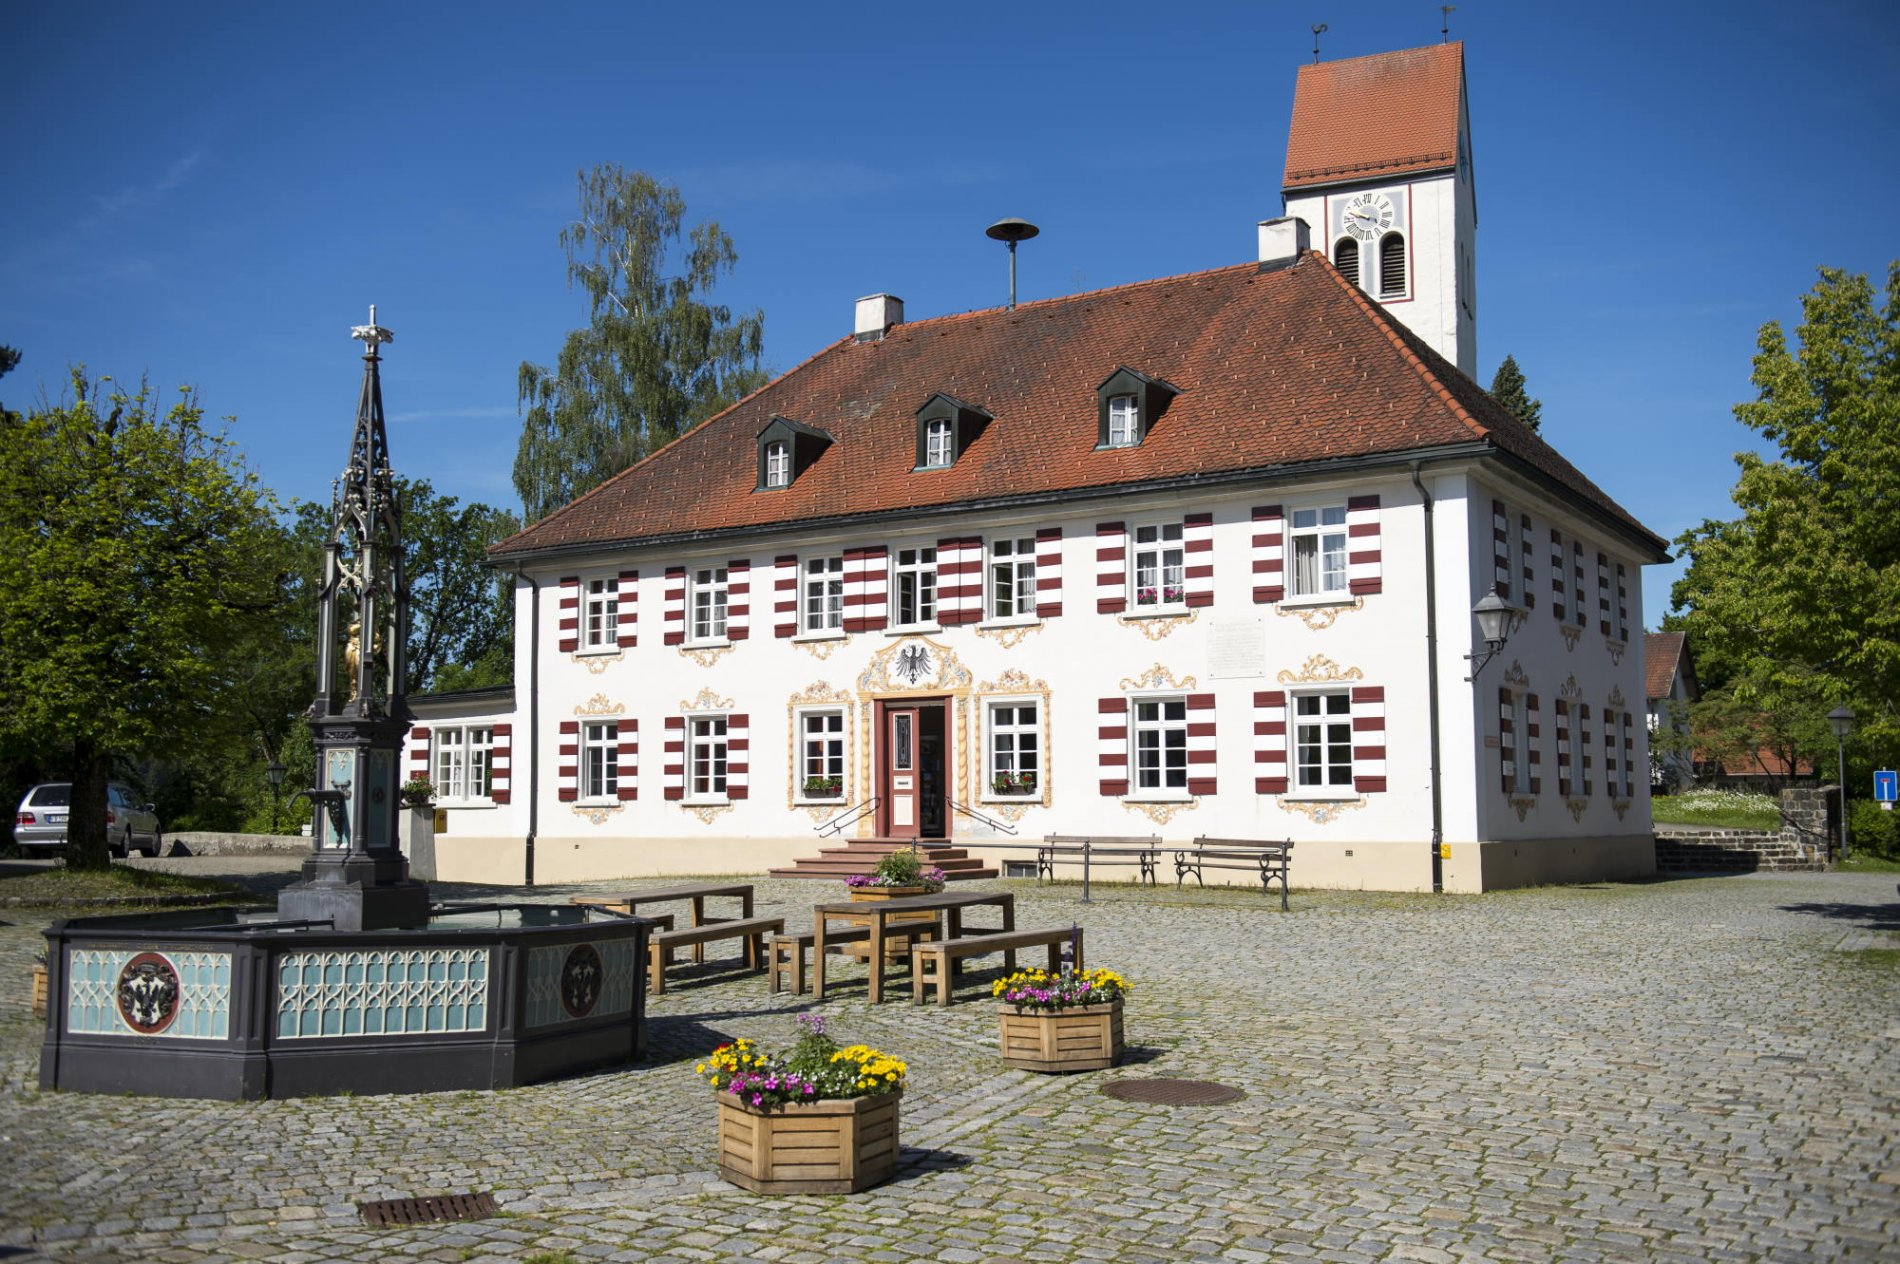 Rathaus am Dorfplatz Eglofs, Argenbühl